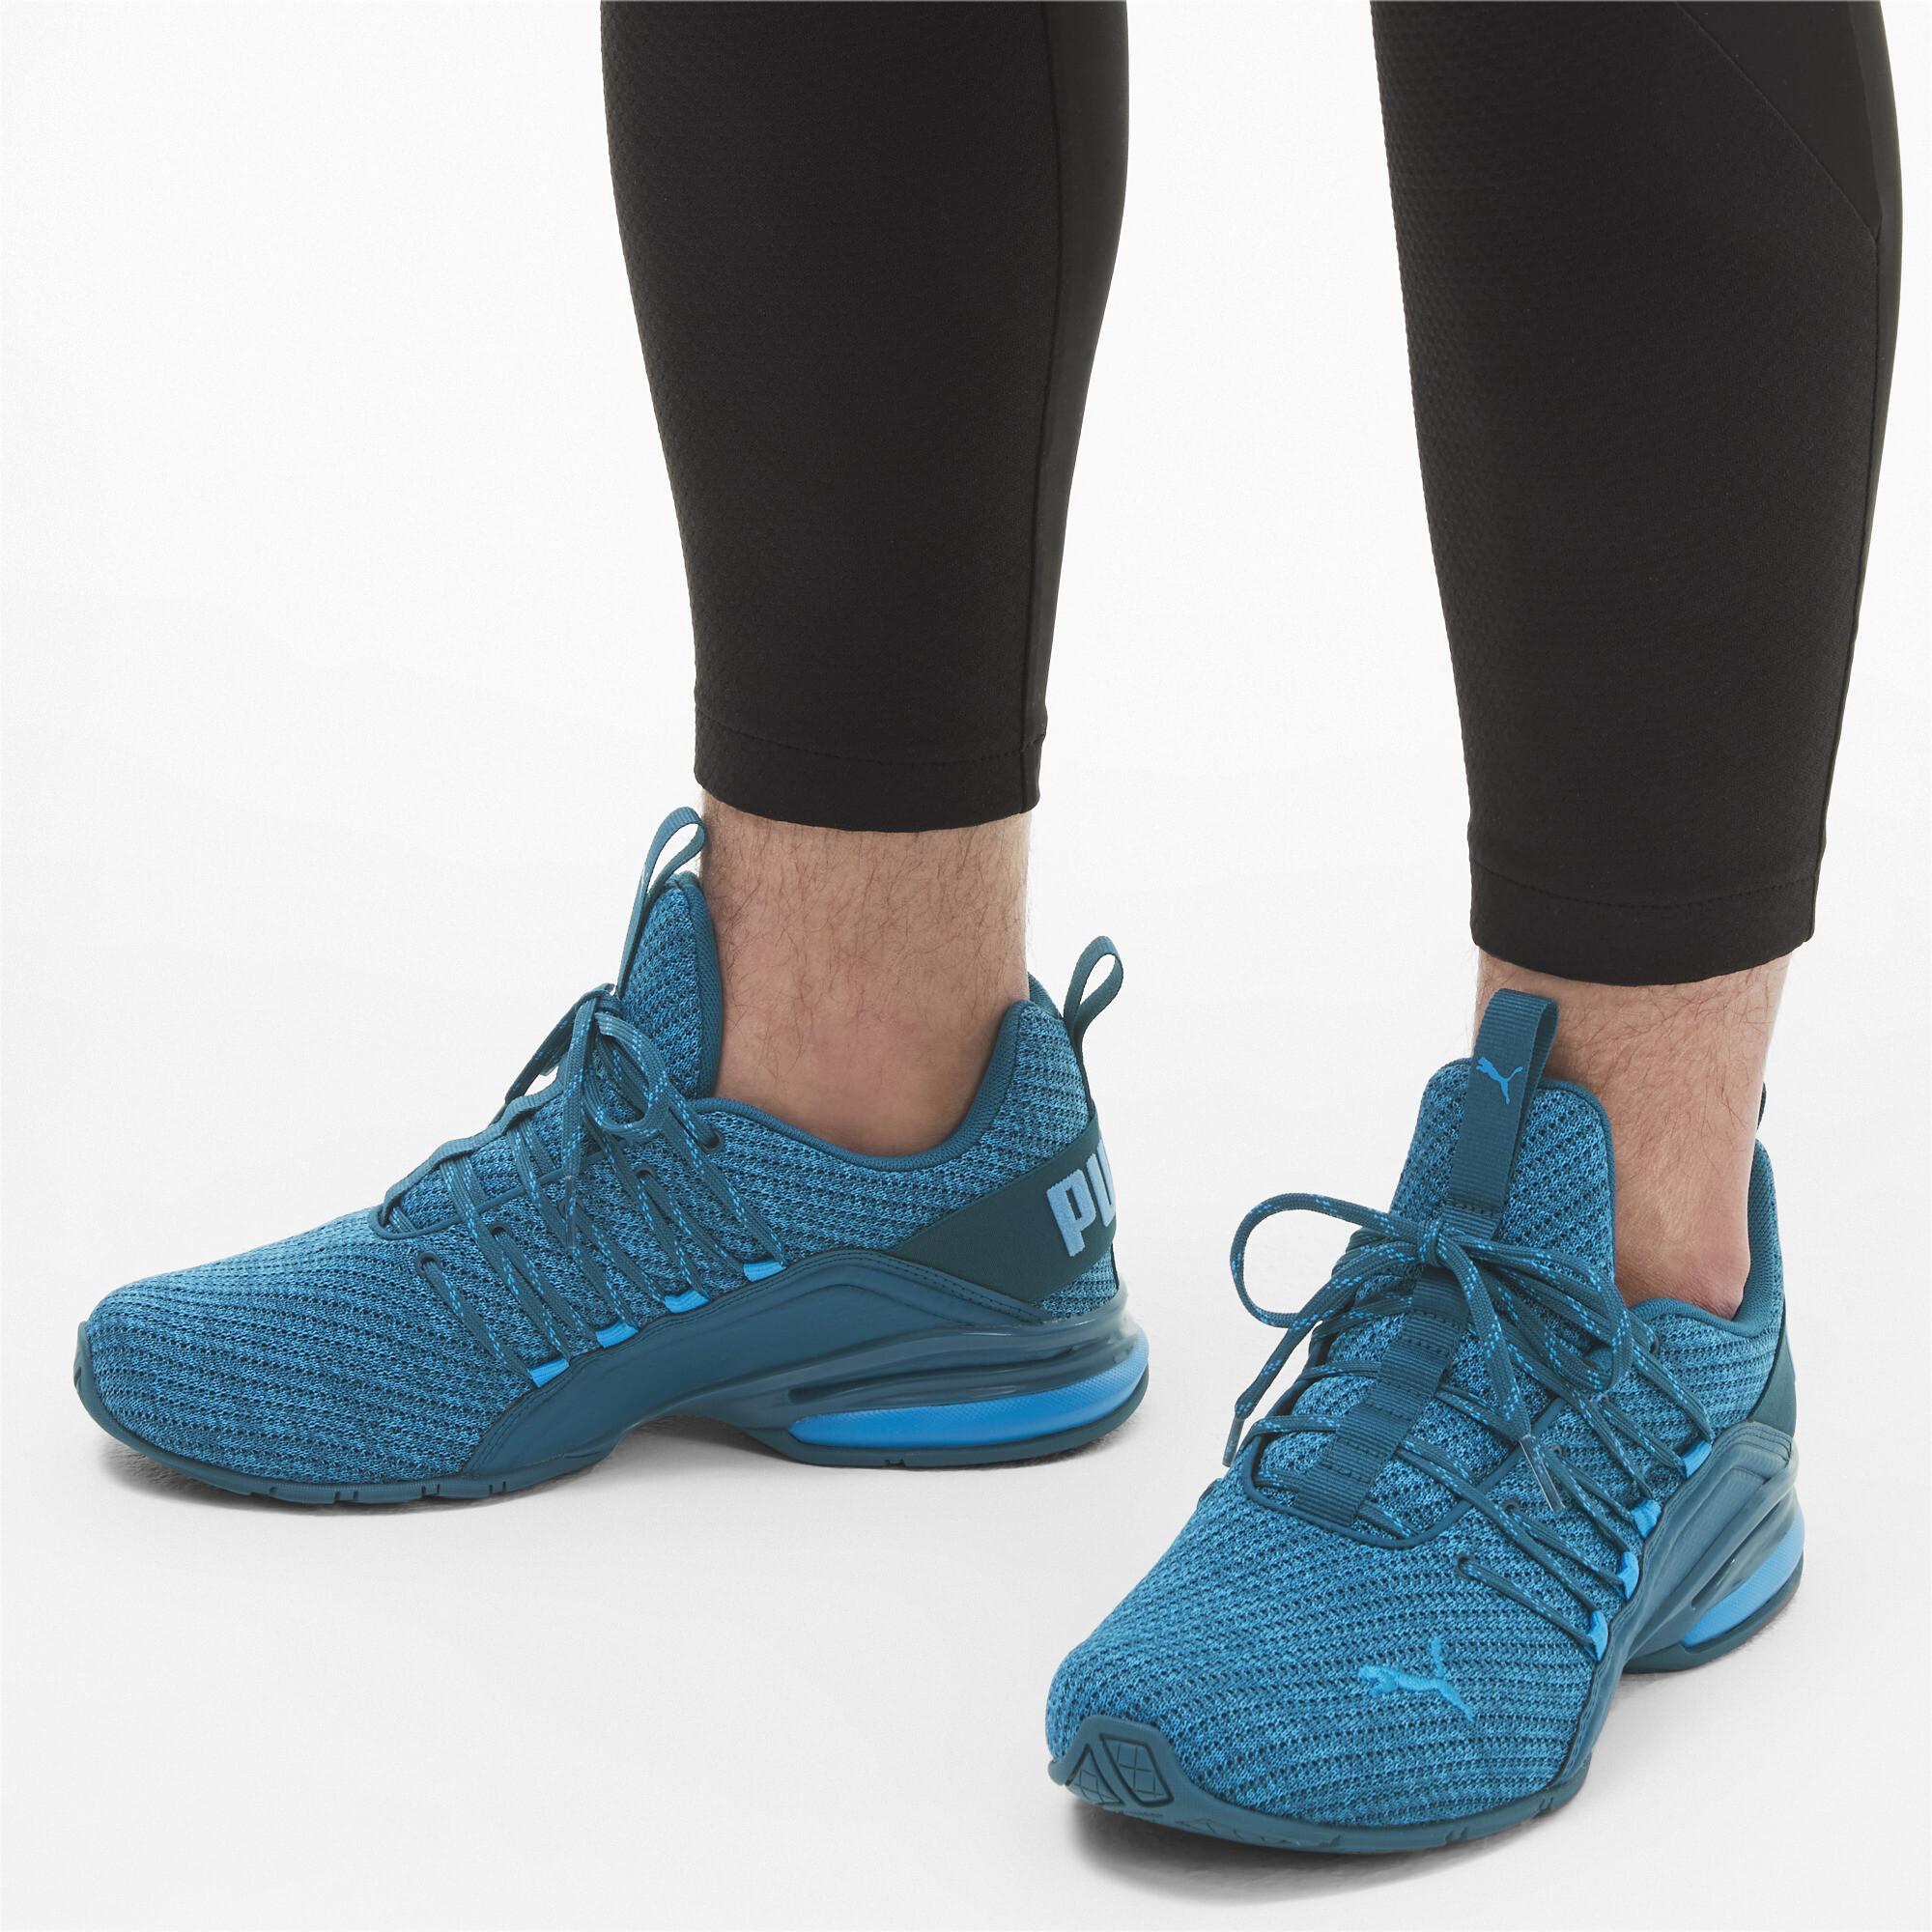 PUMA-Men-039-s-Axelion-Ultra-Running-Shoes thumbnail 19